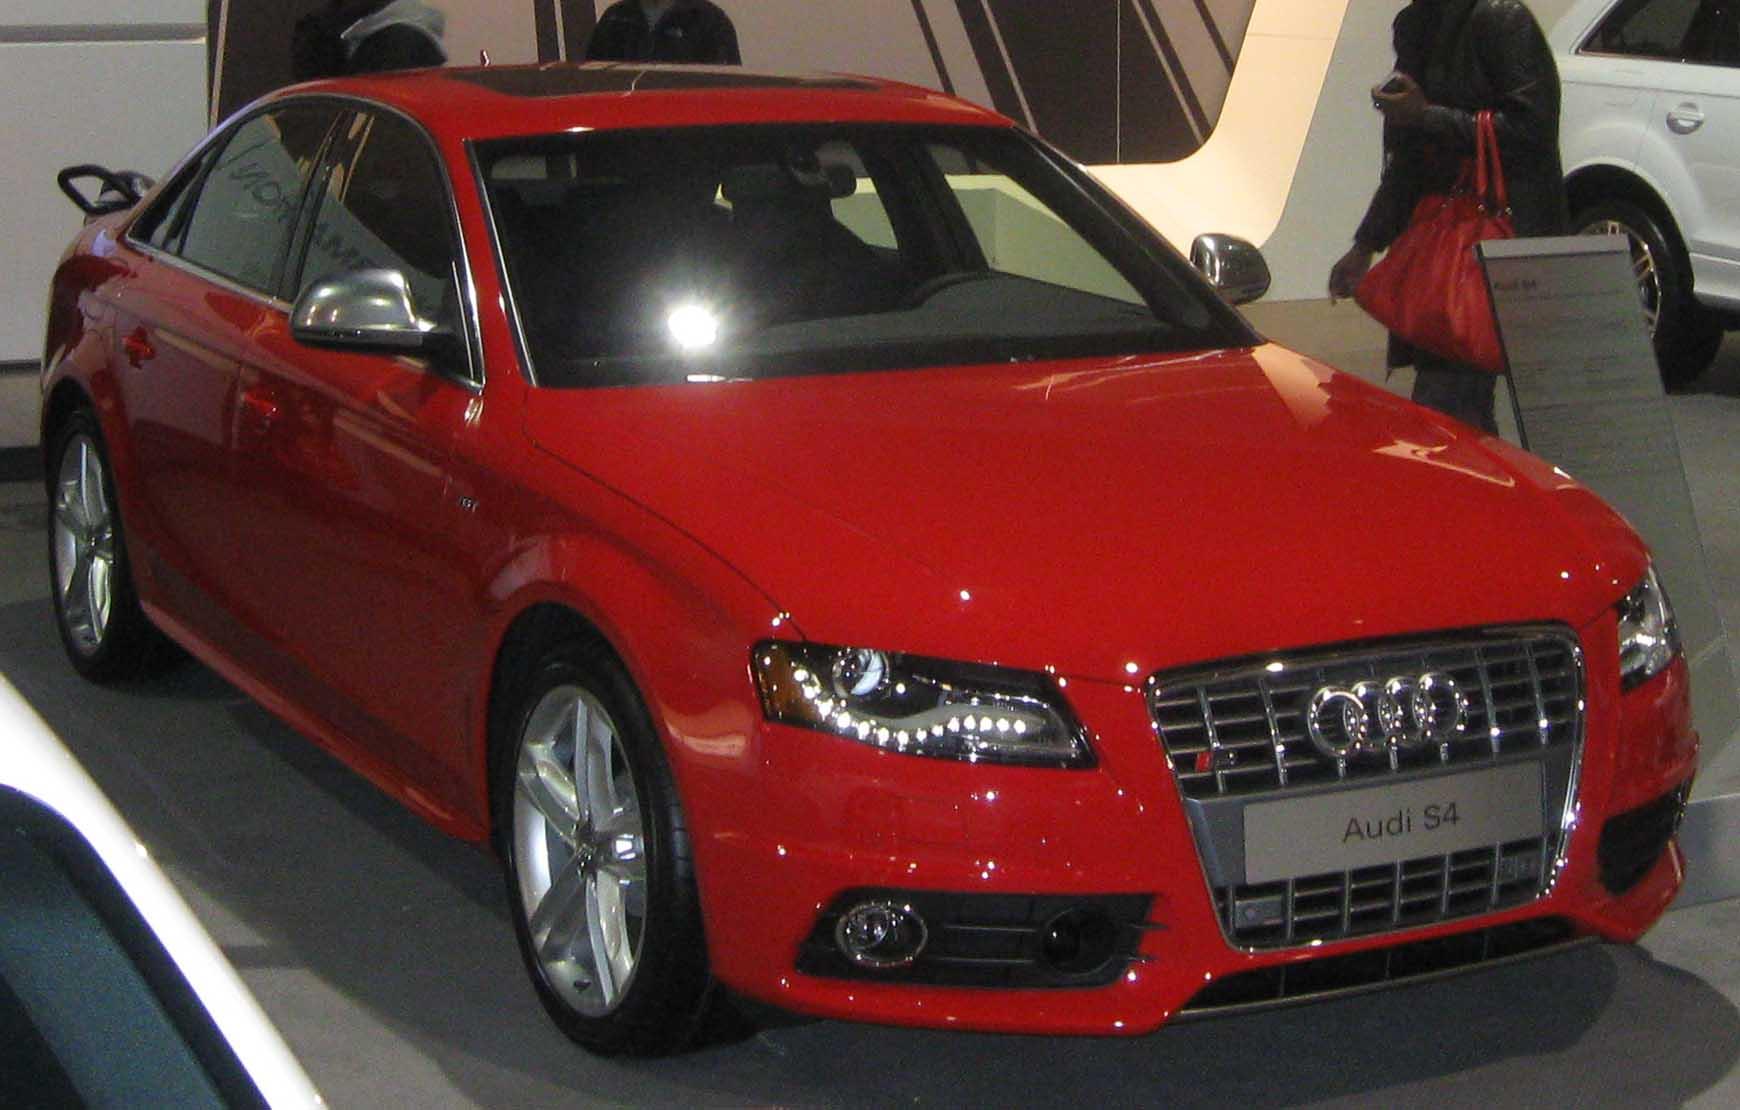 hight resolution of file 2010 audi s4 sedan dc jpg